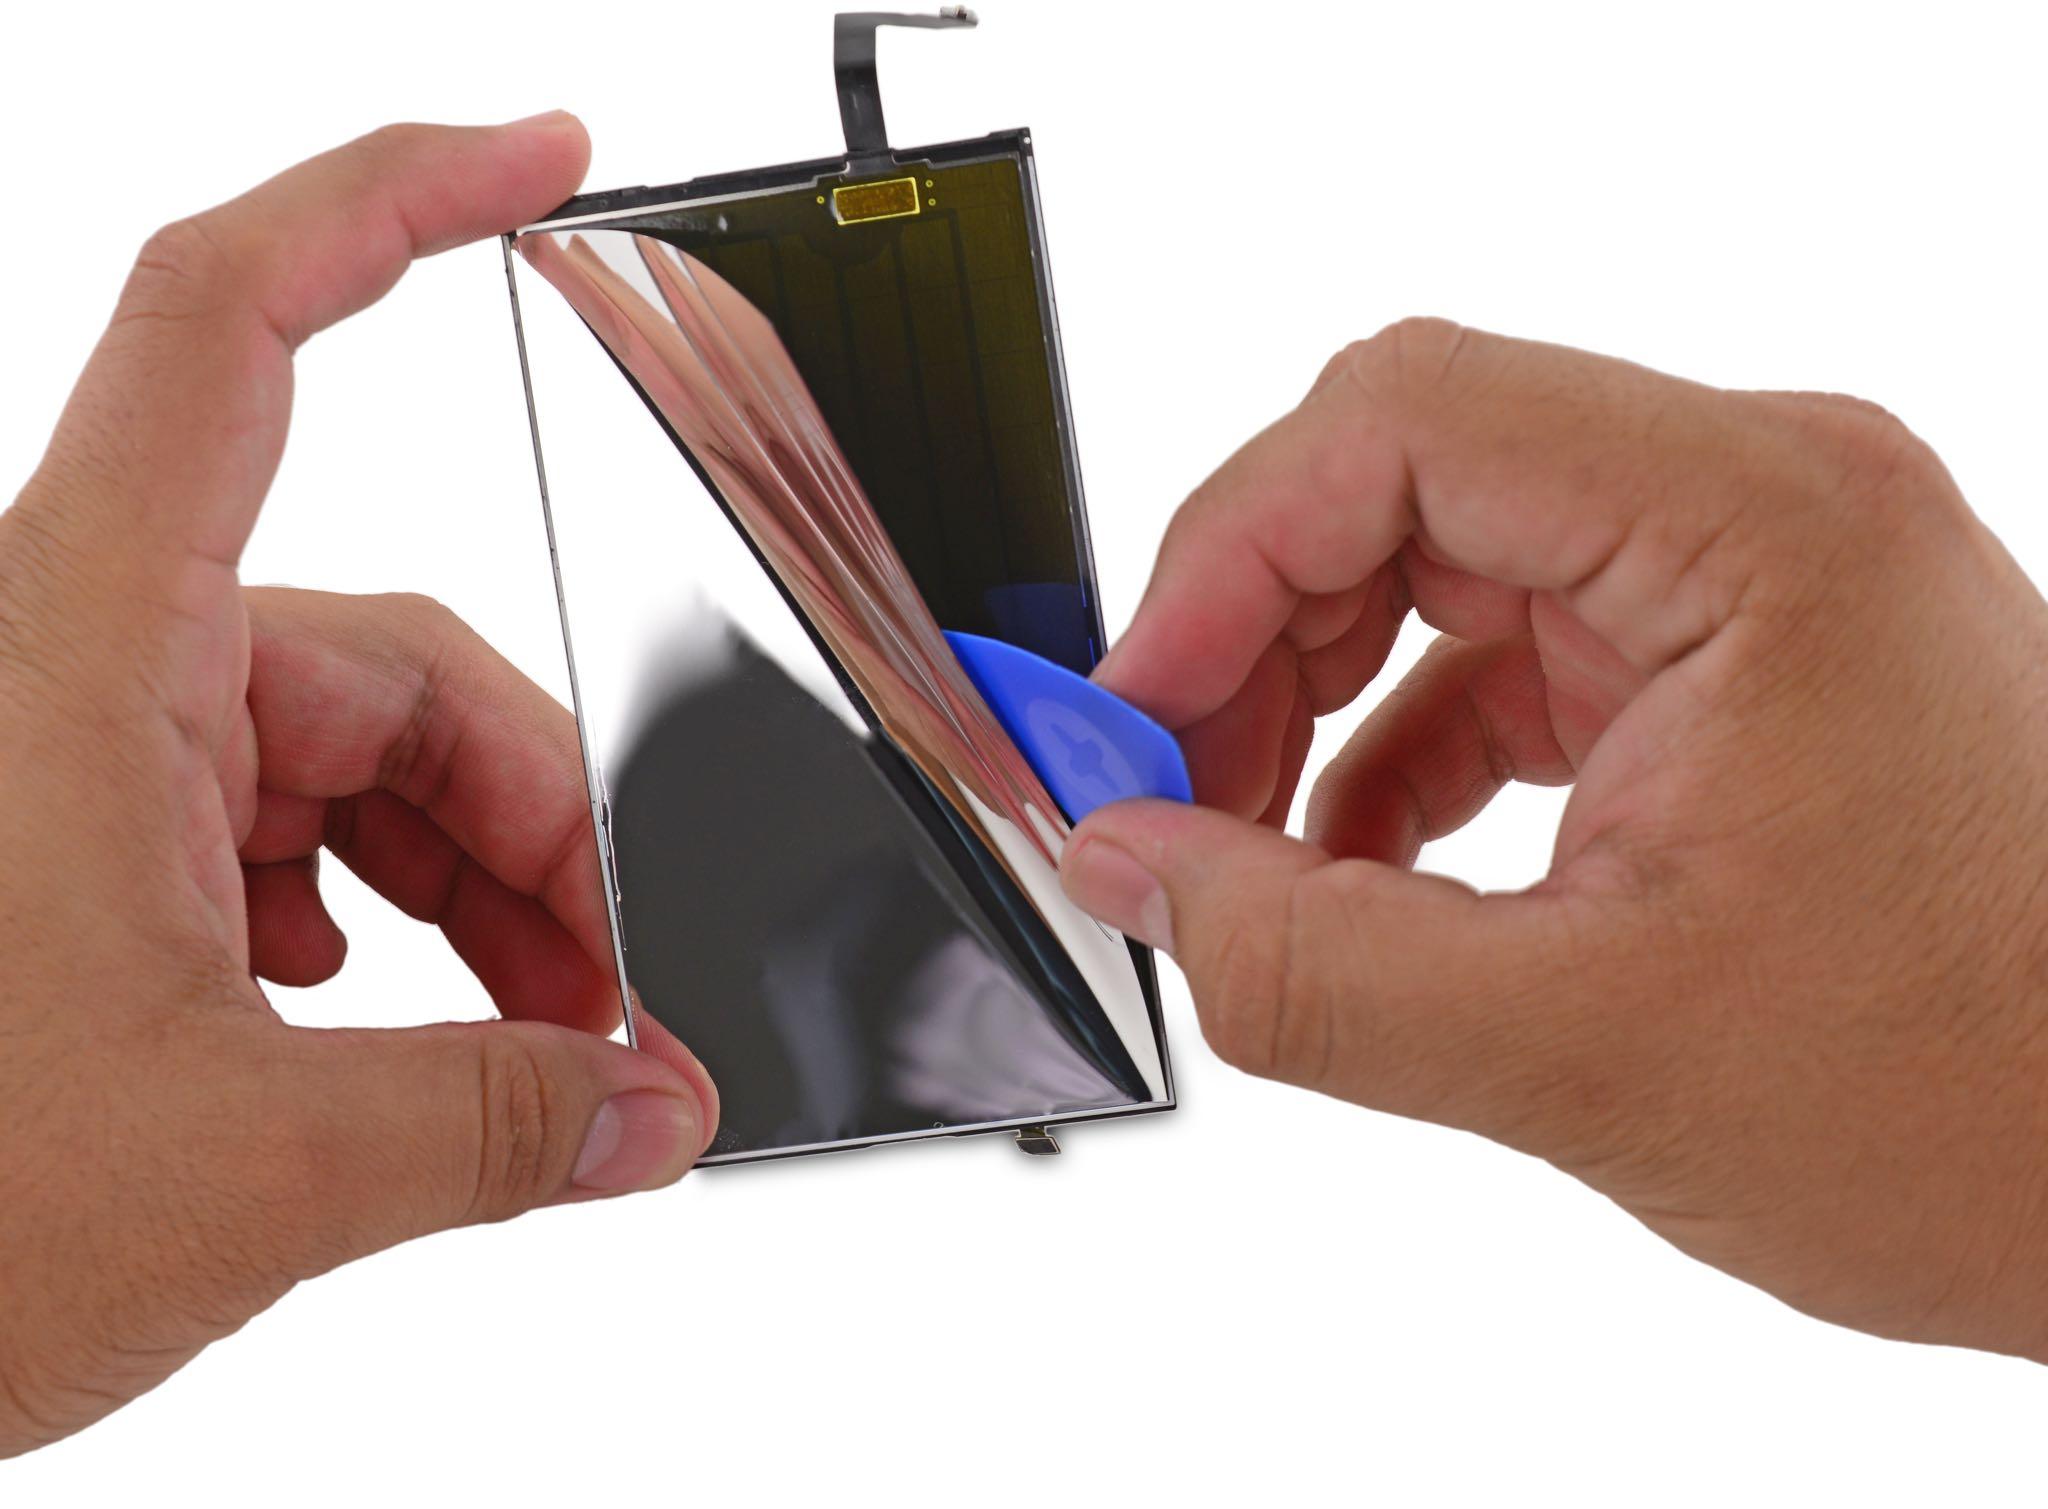 iPhone 6s Display iFixit teardown image 002